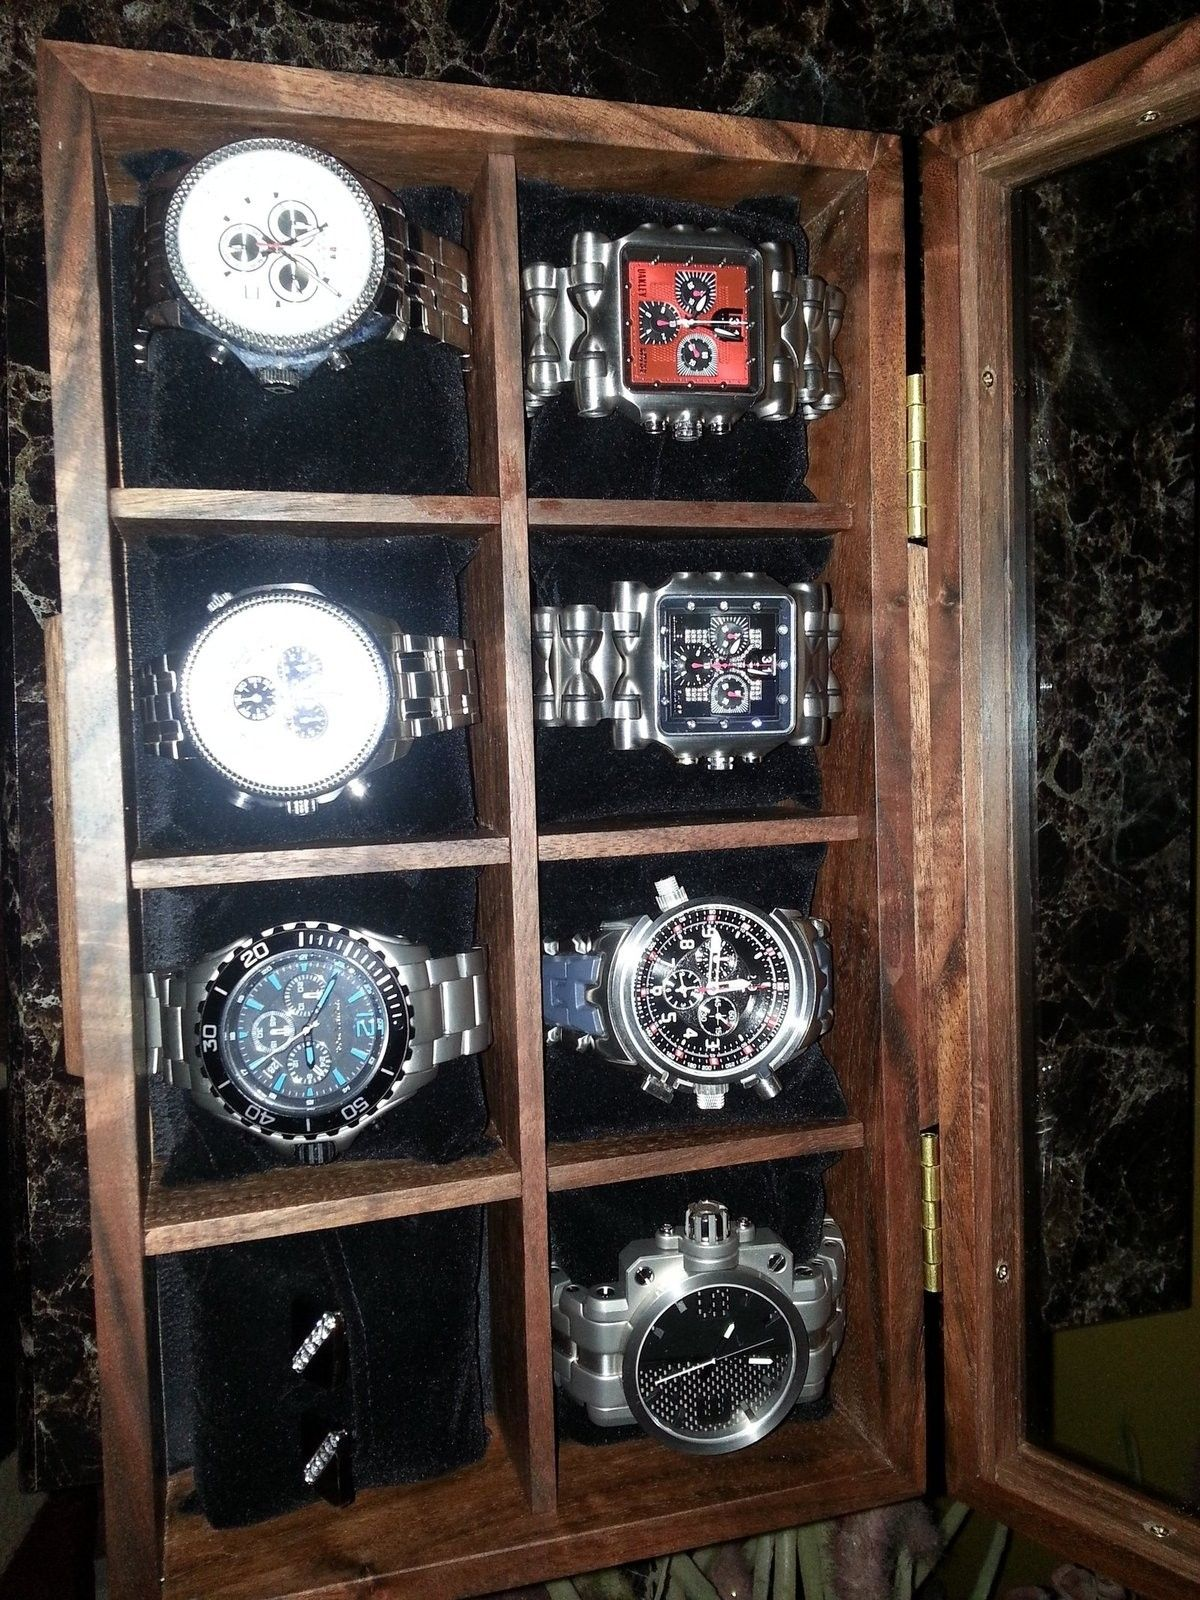 Got a new watch box.....collection growing - 20151201_220241.jpg